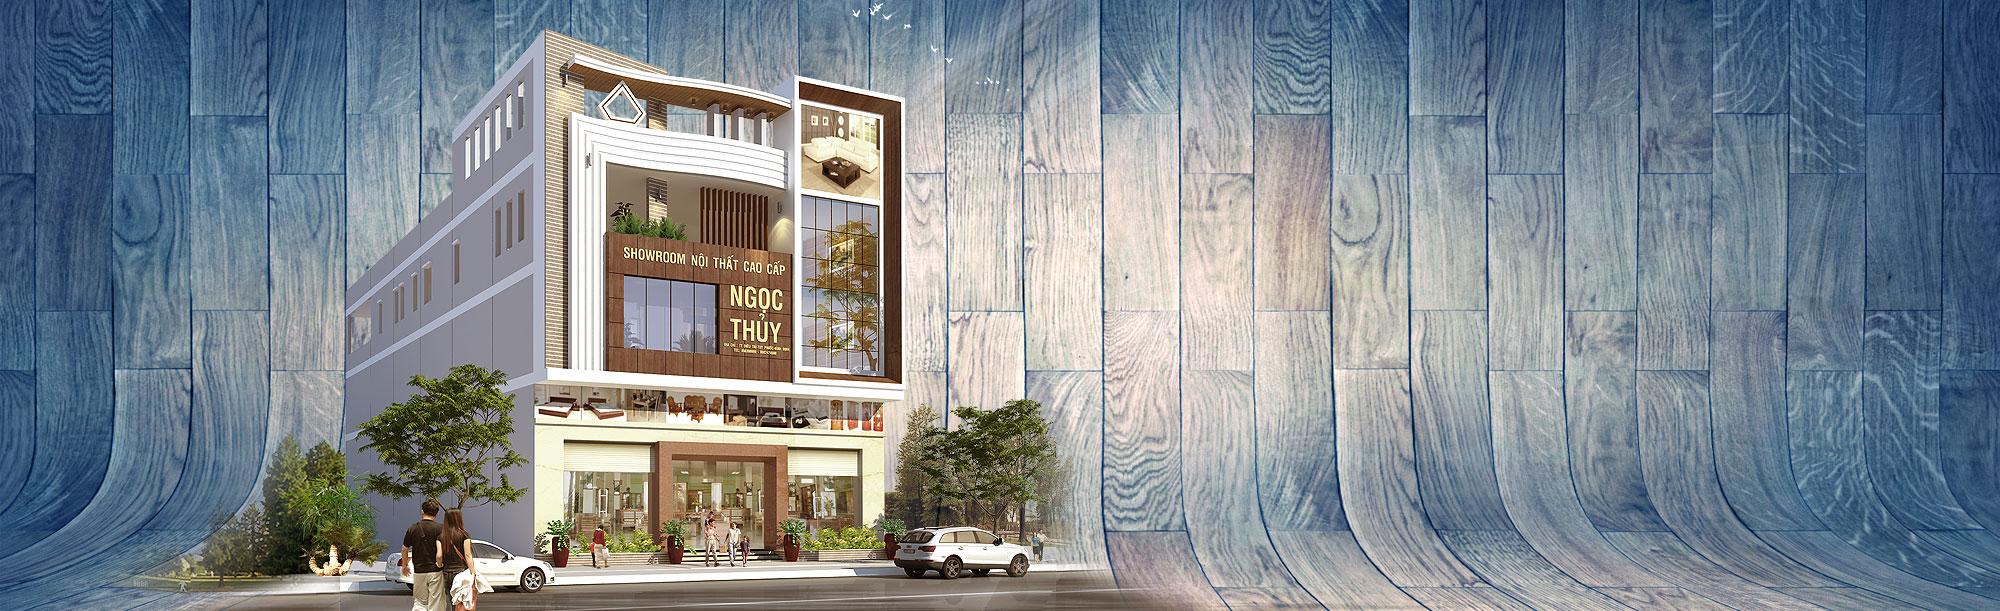 Showroom-noi-that-Ngoc-Thuy